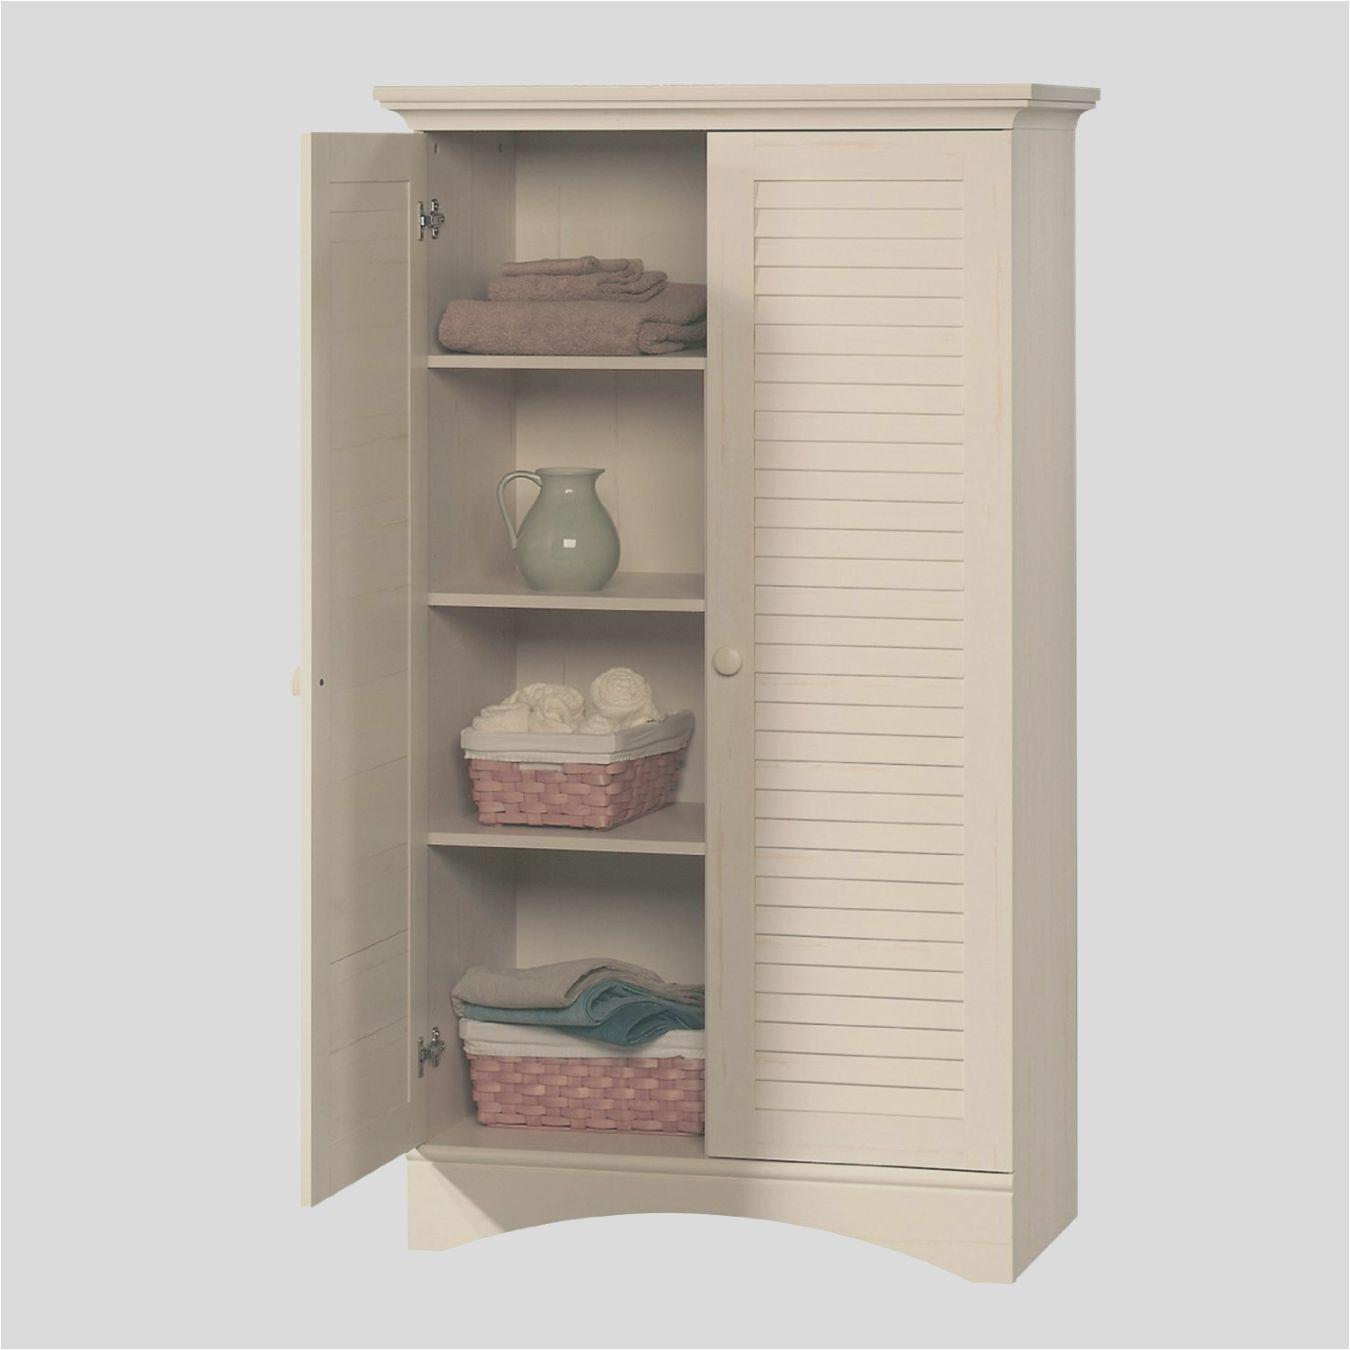 50 Stylish 2 Door File Cabinets Plan 2 Door File Cabinets Best